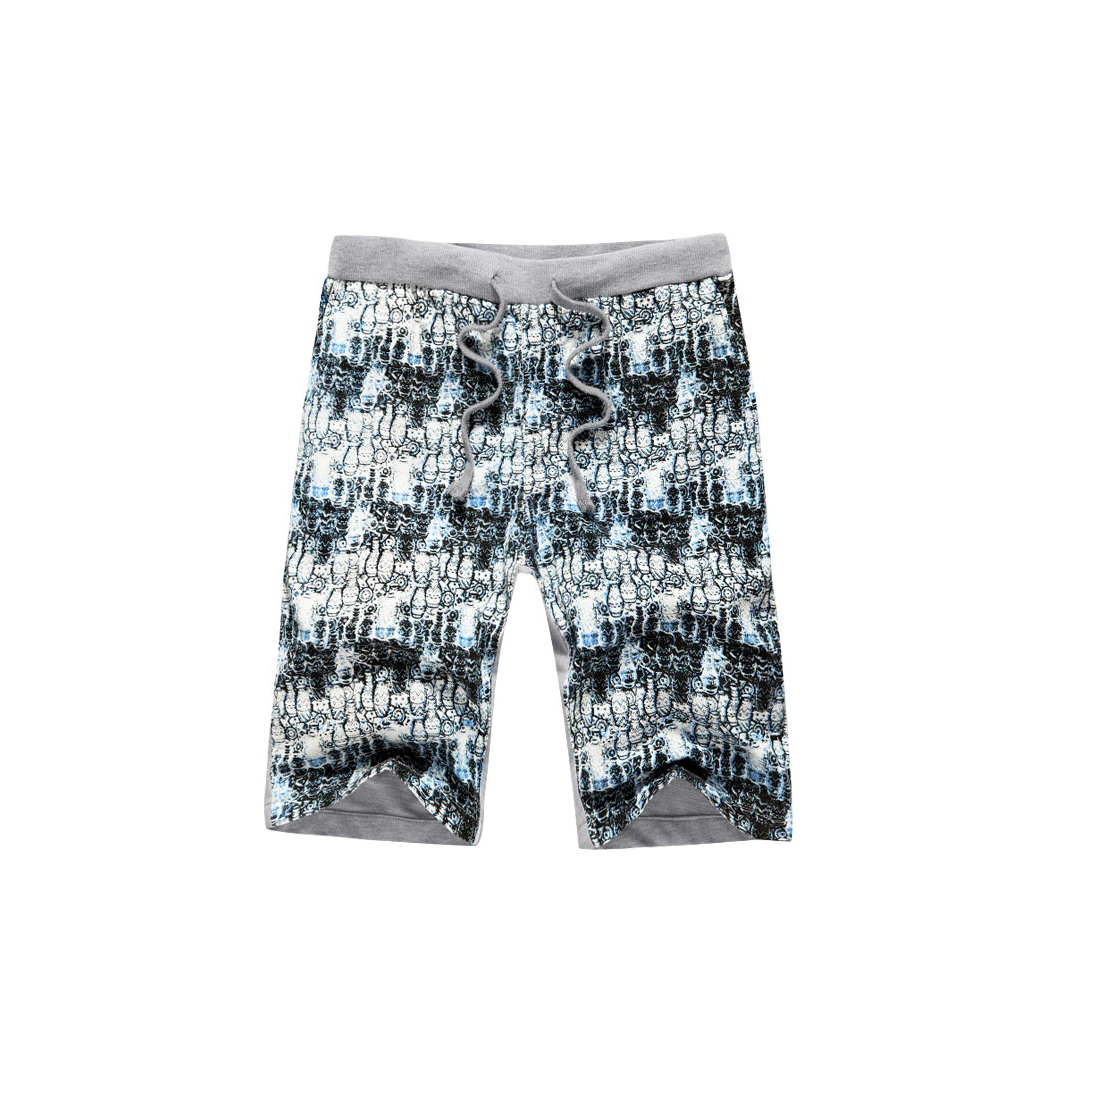 Man Drawstring Pockets Bottles Printed Shorts Light Blue W28